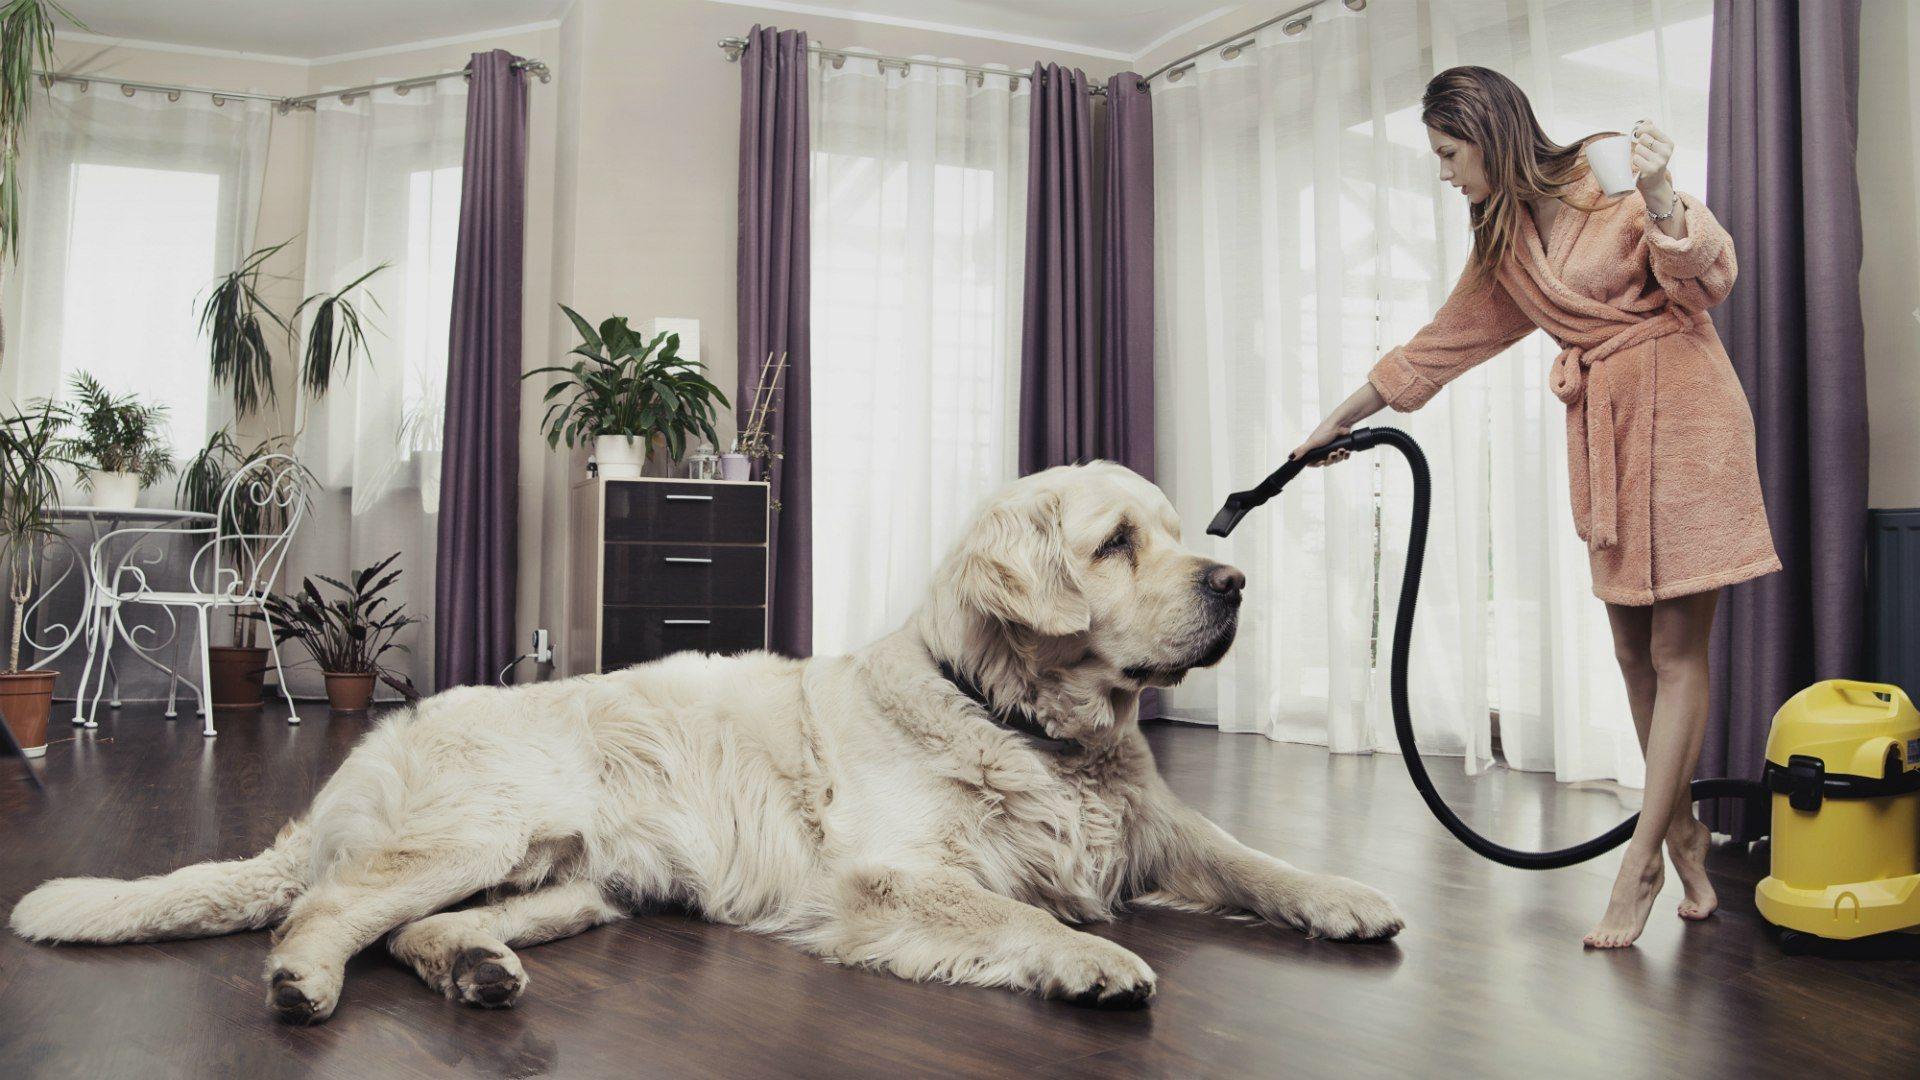 Animals___Dogs_The_hostess_vacuuming_dog_094319_.jpg